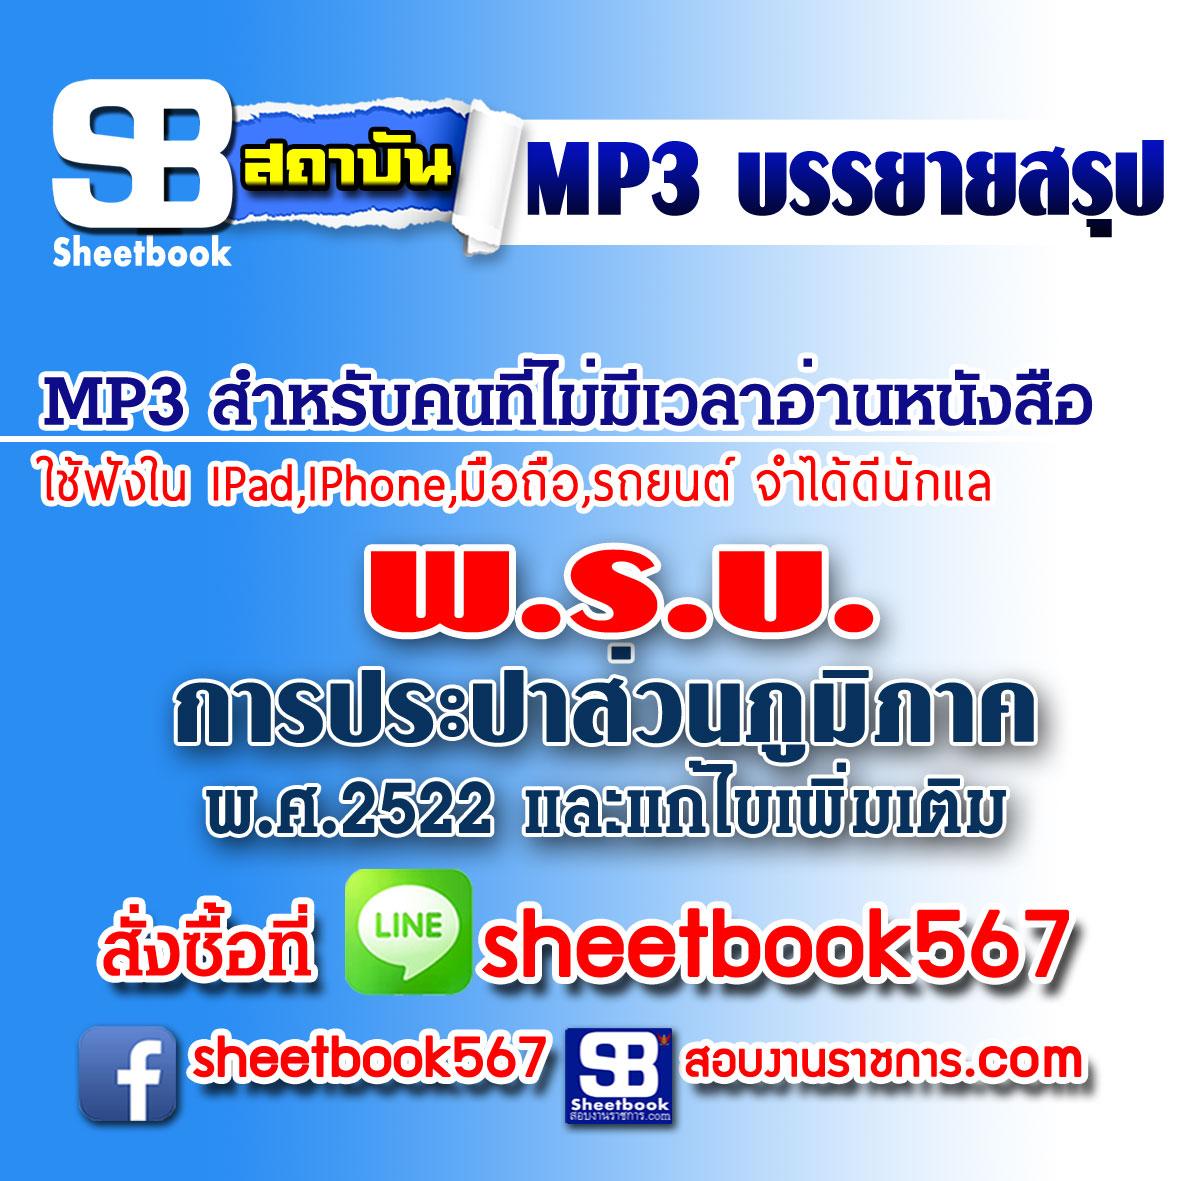 P042 - พระราชบัญญัติการประปาส่วนภูมิภาค พศ 2522 และแก้ไขเพิ่มเติม